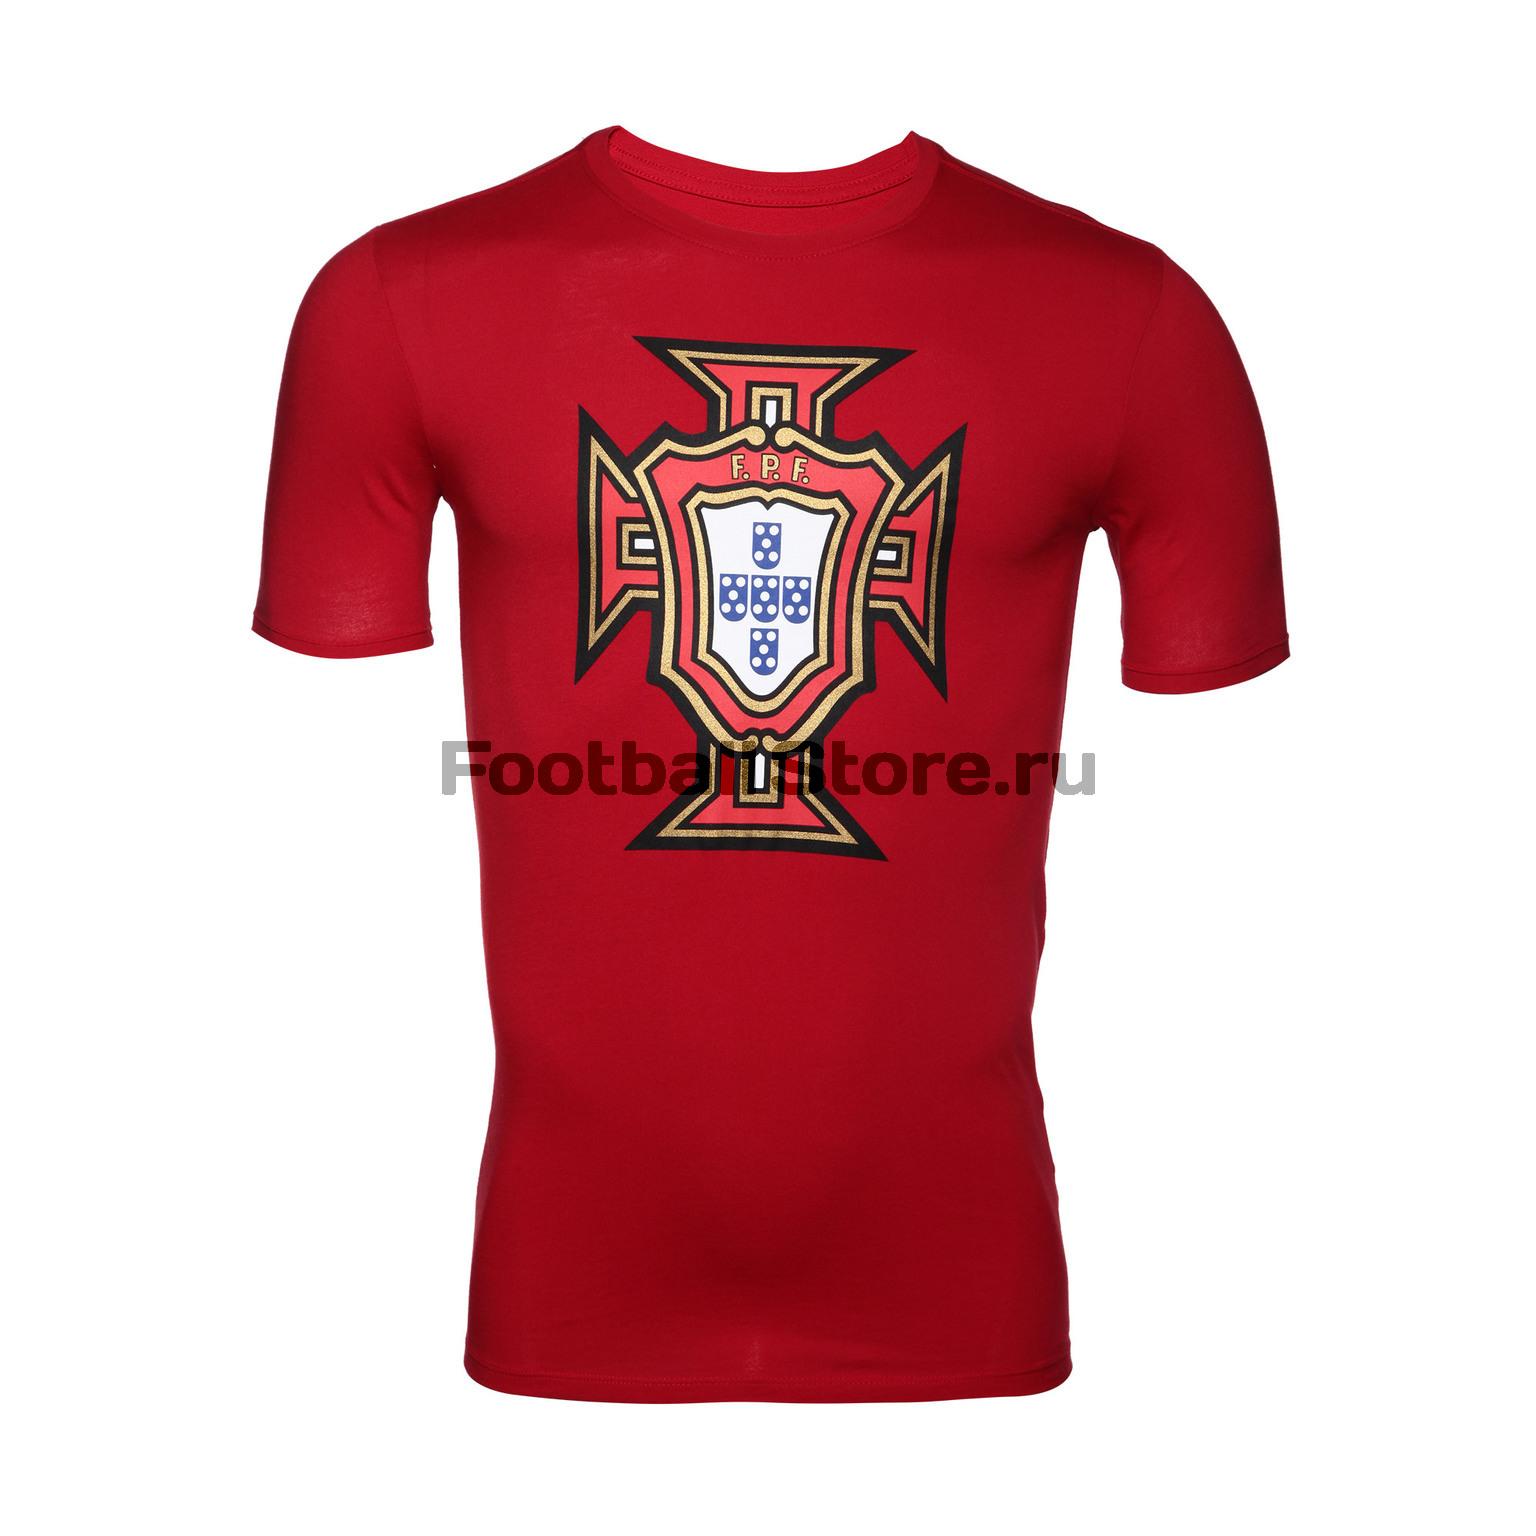 Футболка Nike сборной Португалии 909843-687 косметика из португалии